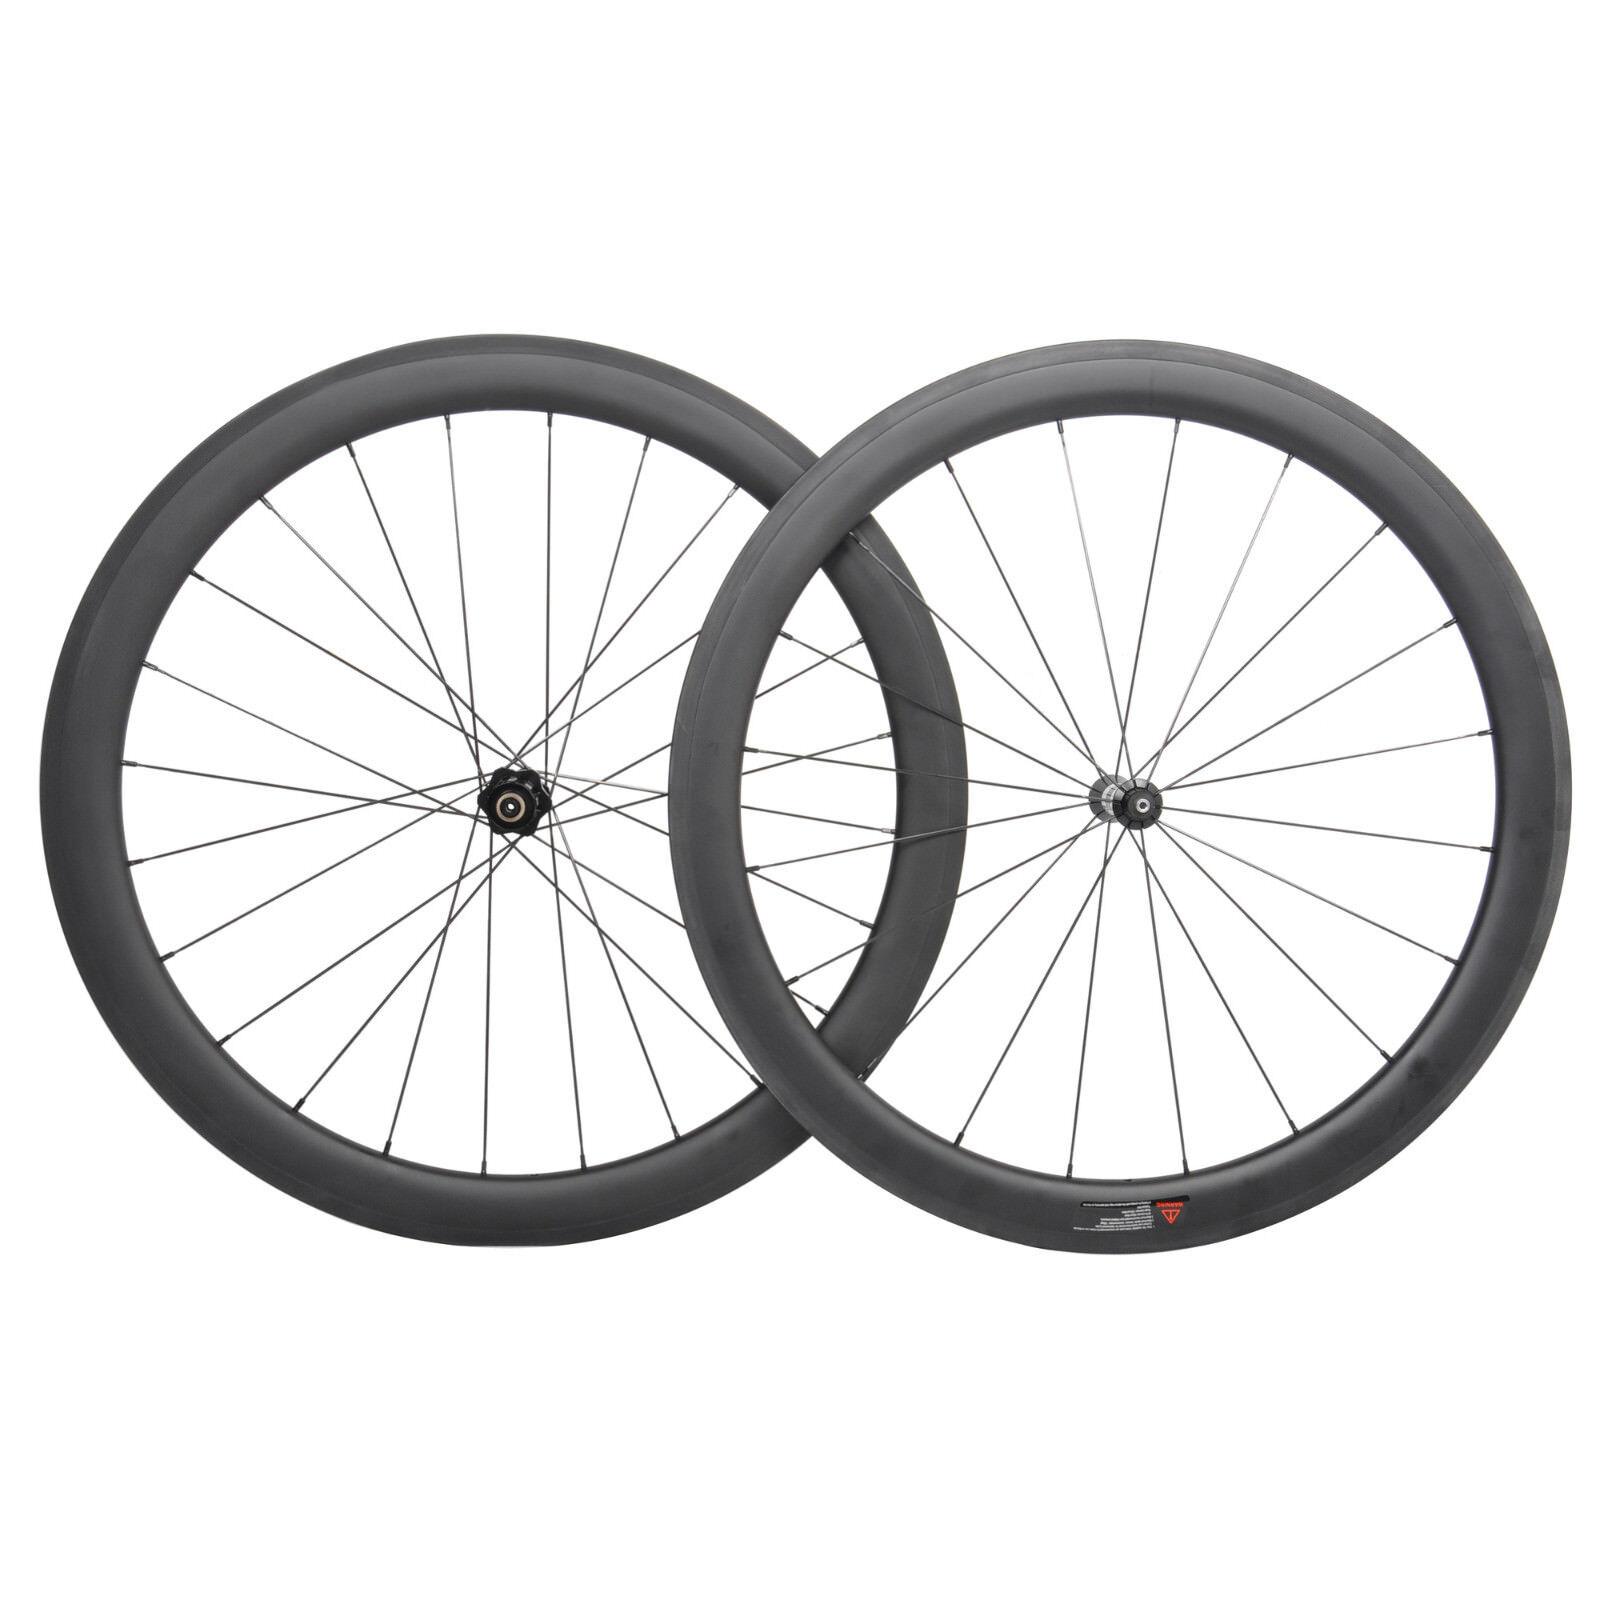 DT350s 50mm Sapim Carbon Wheel Clincher Tubeless Road Bike 700C UD Matt Rim 27mm